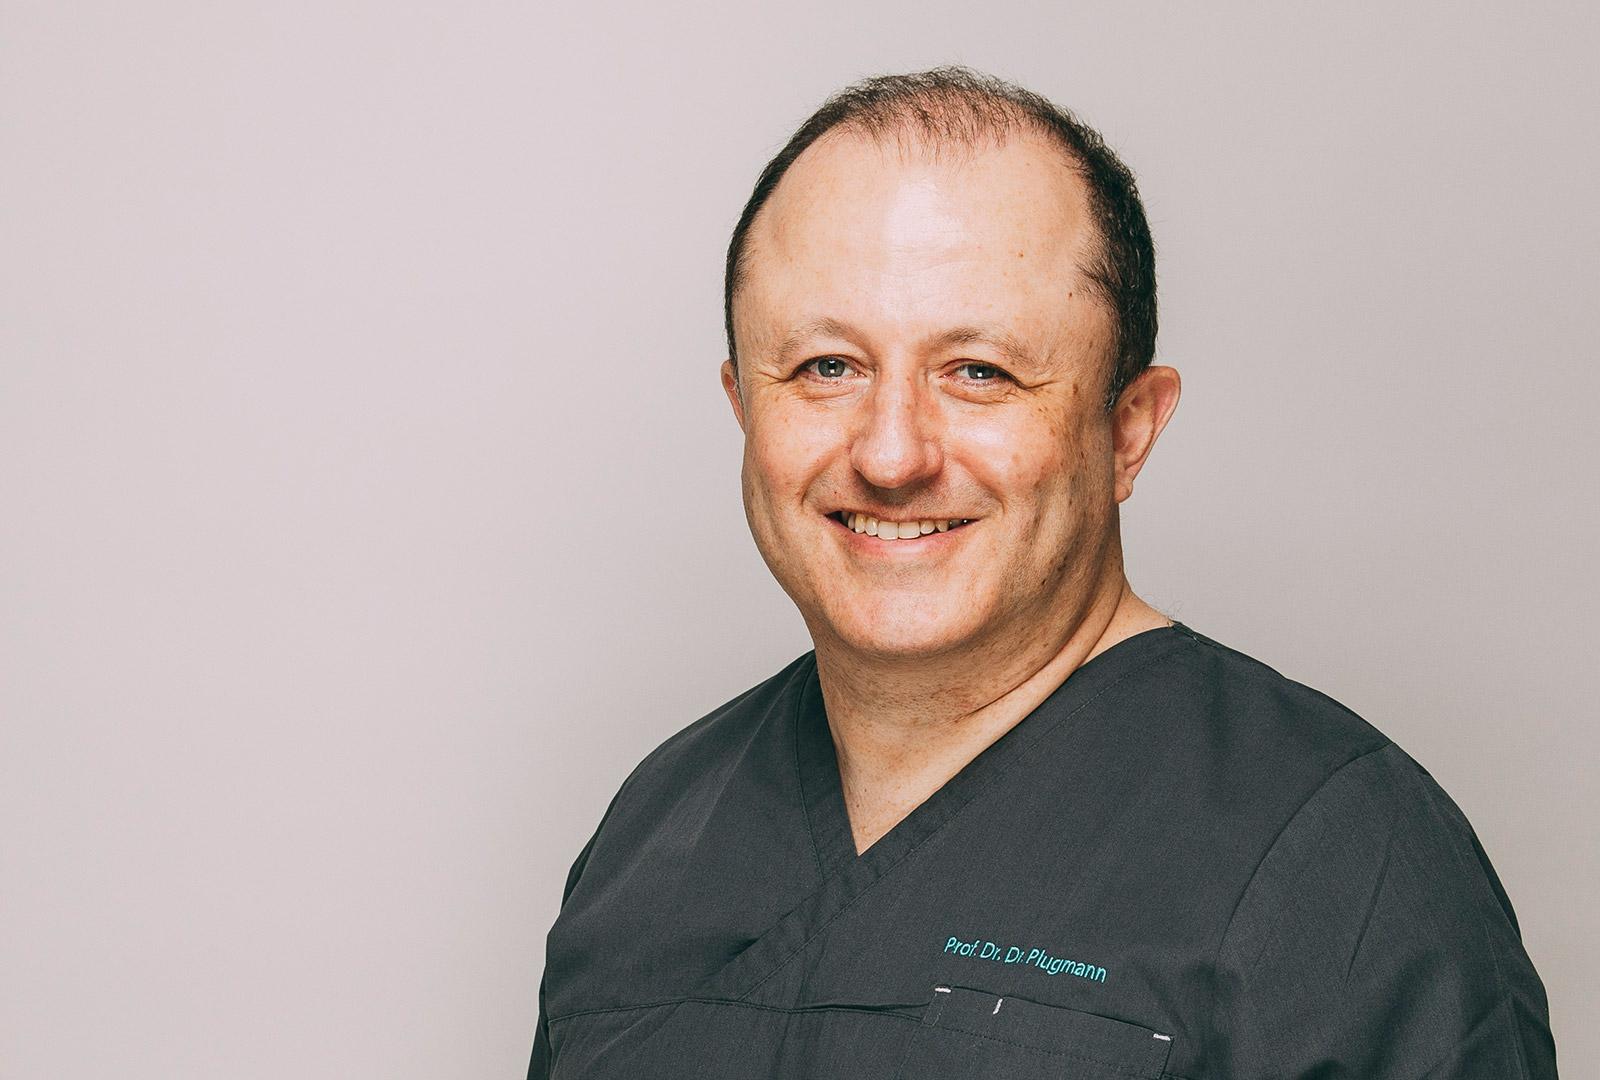 Prof. Dr. Dr. Philipp Plugmann, Zahnarzt Leverkusen